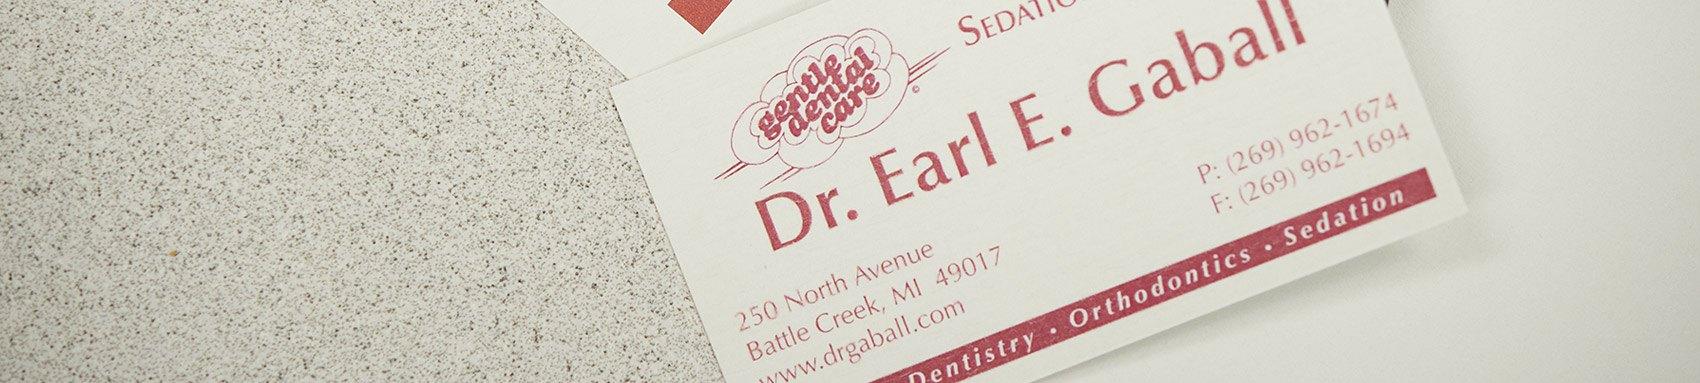 Contact Us - Earl E Gaball DDS